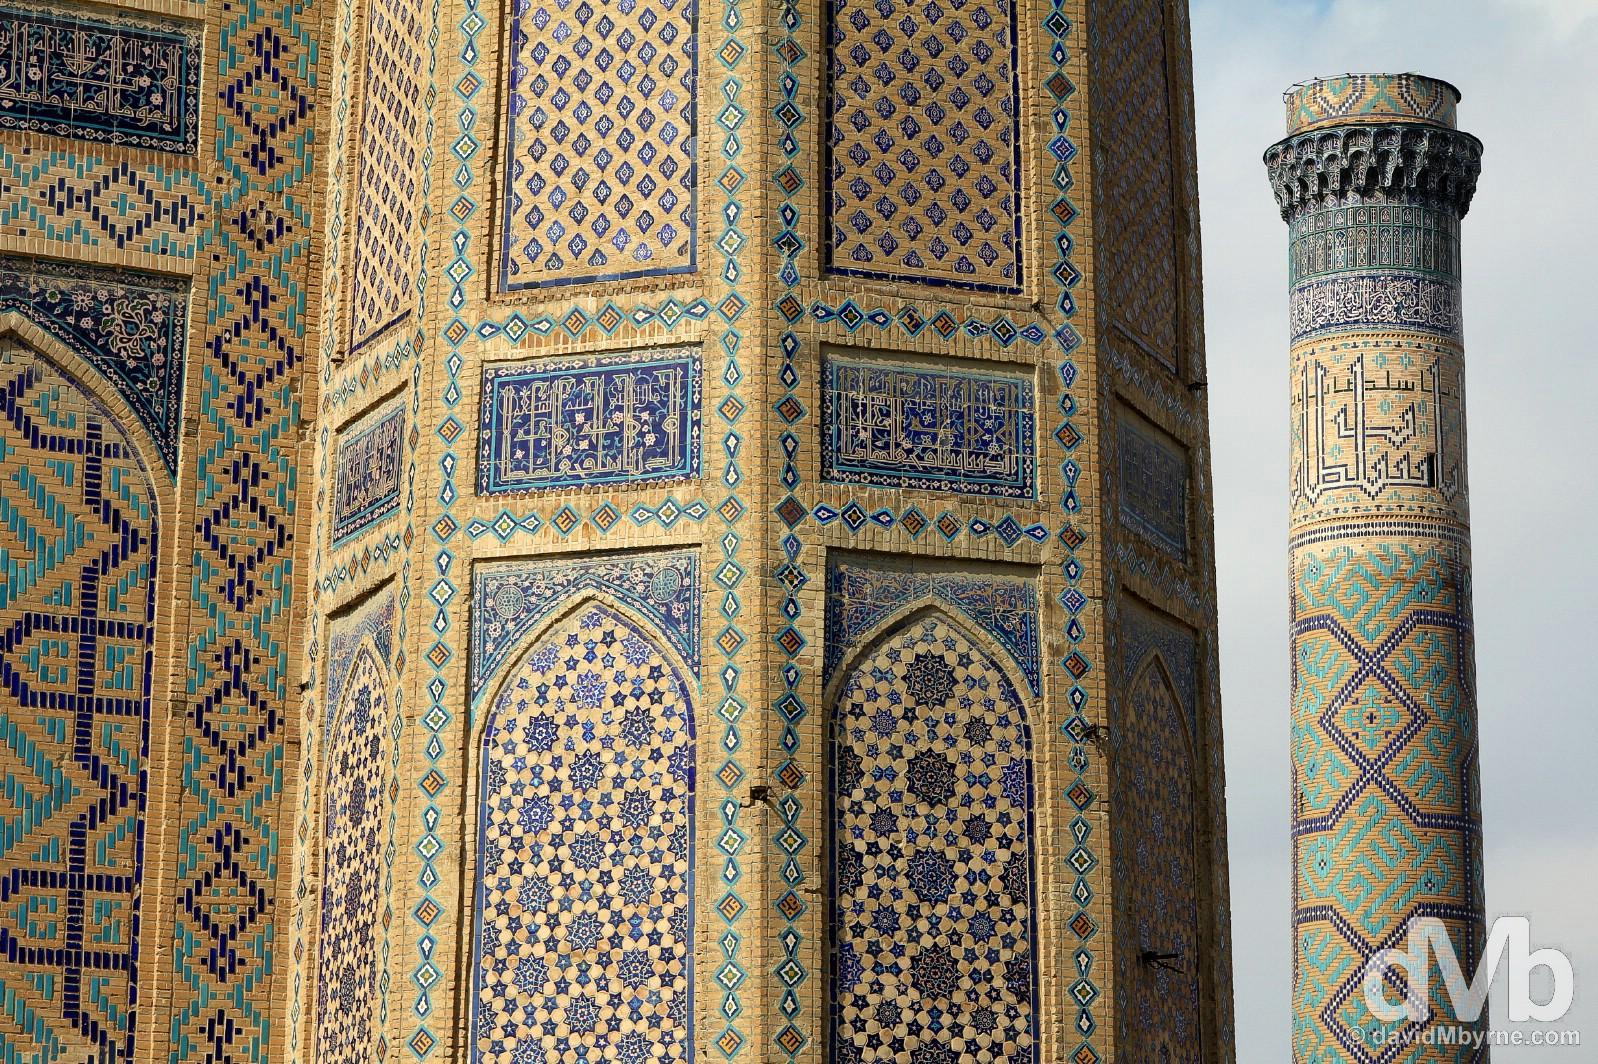 Tilework detail on the main facade & minaret of the Bibi-Khanym Mosque in Samarkand, Uzbekistan. March 8, 2015.